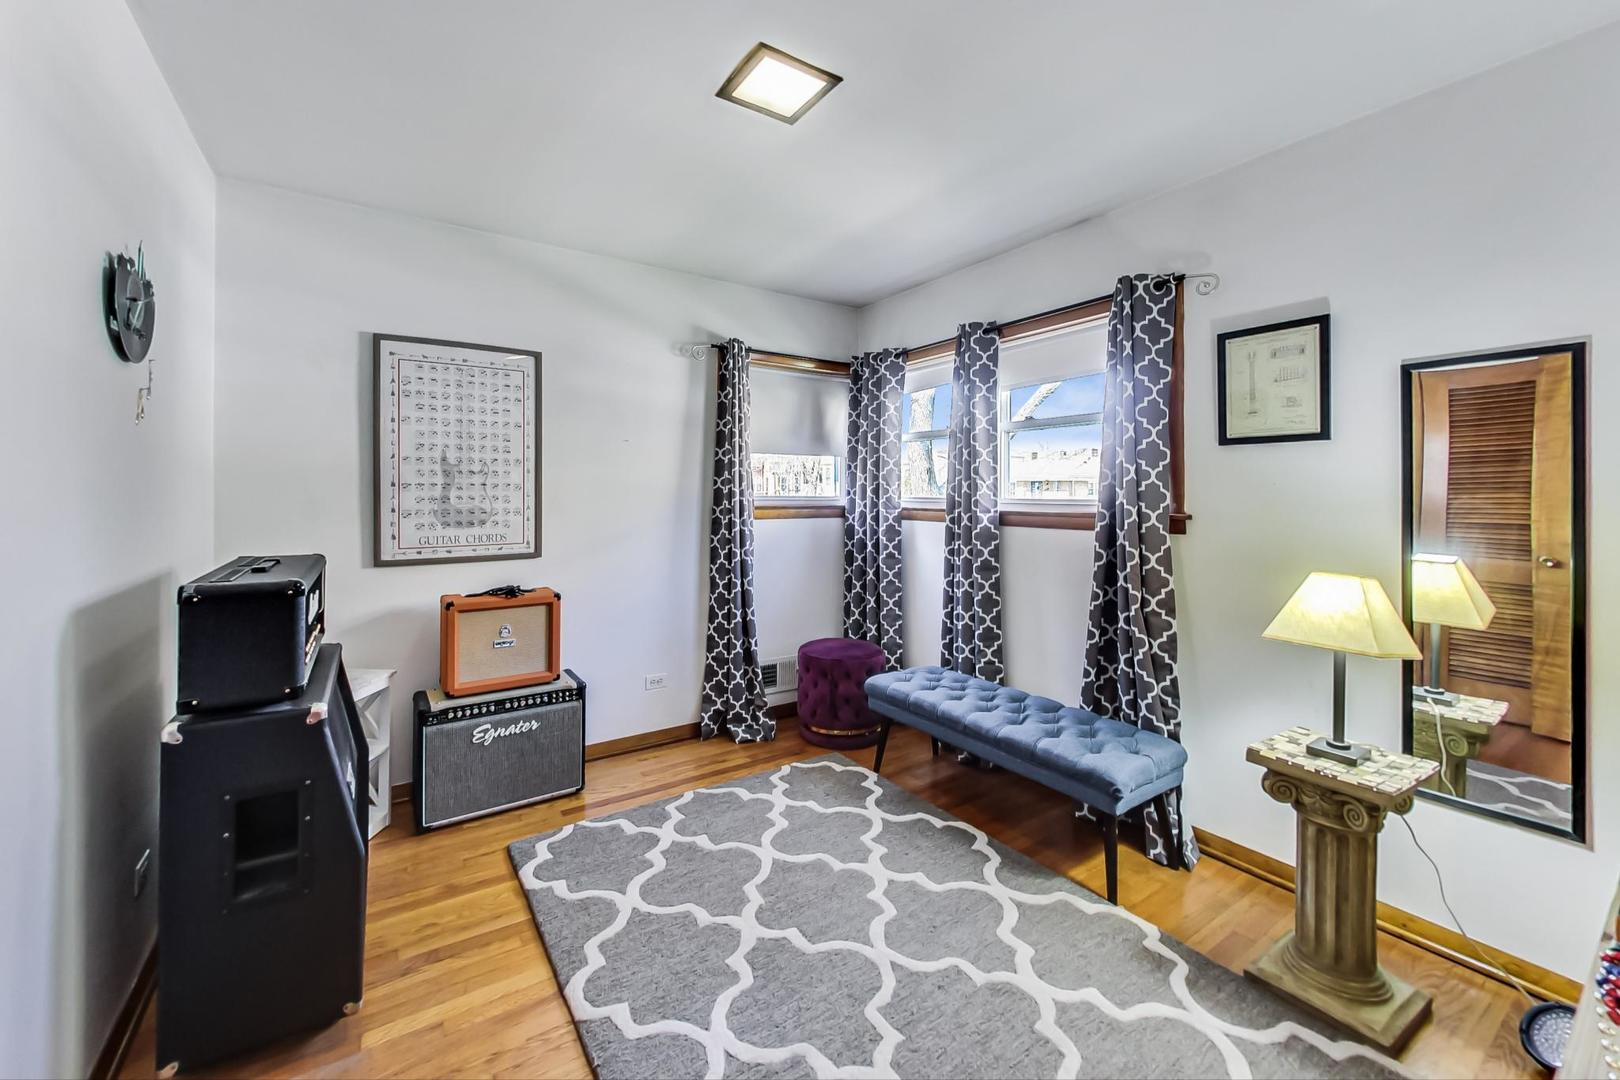 3259 Berteau ,Chicago, Illinois 60618